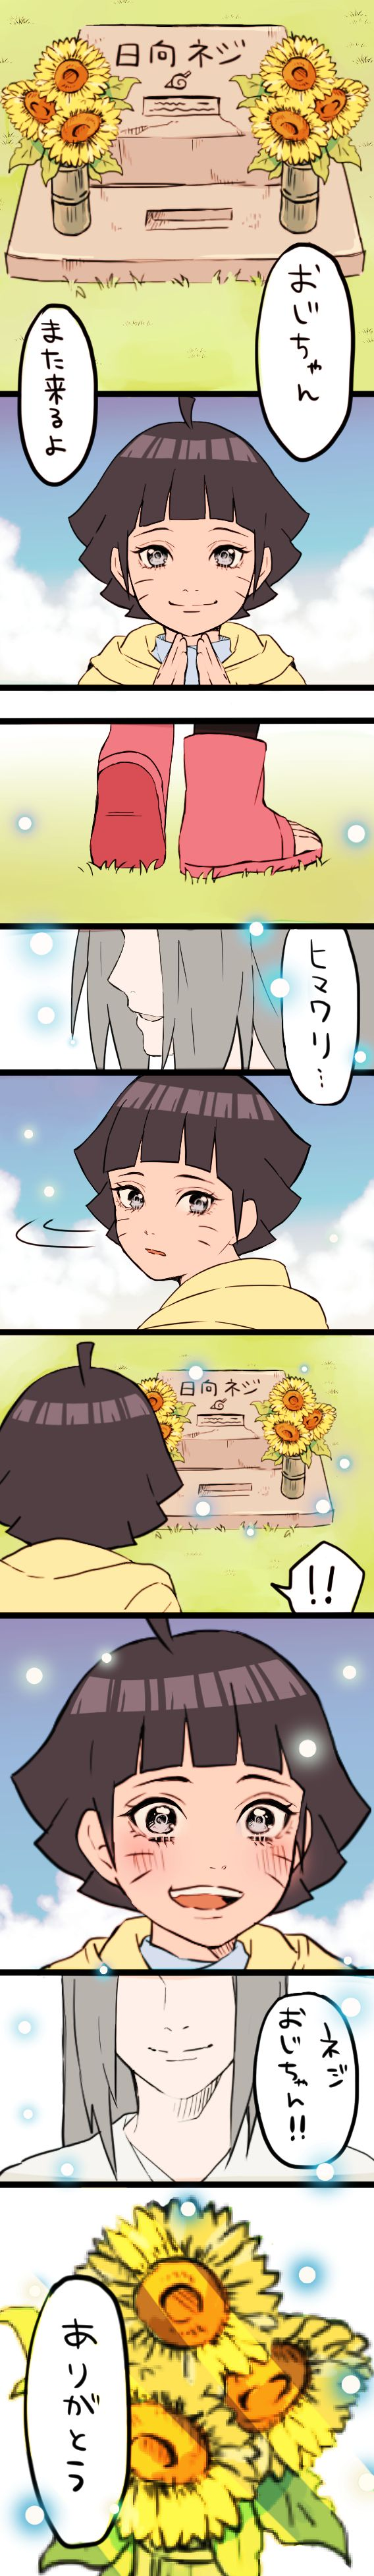 Neji And Himawari I Love Their Relationship Sunflowers